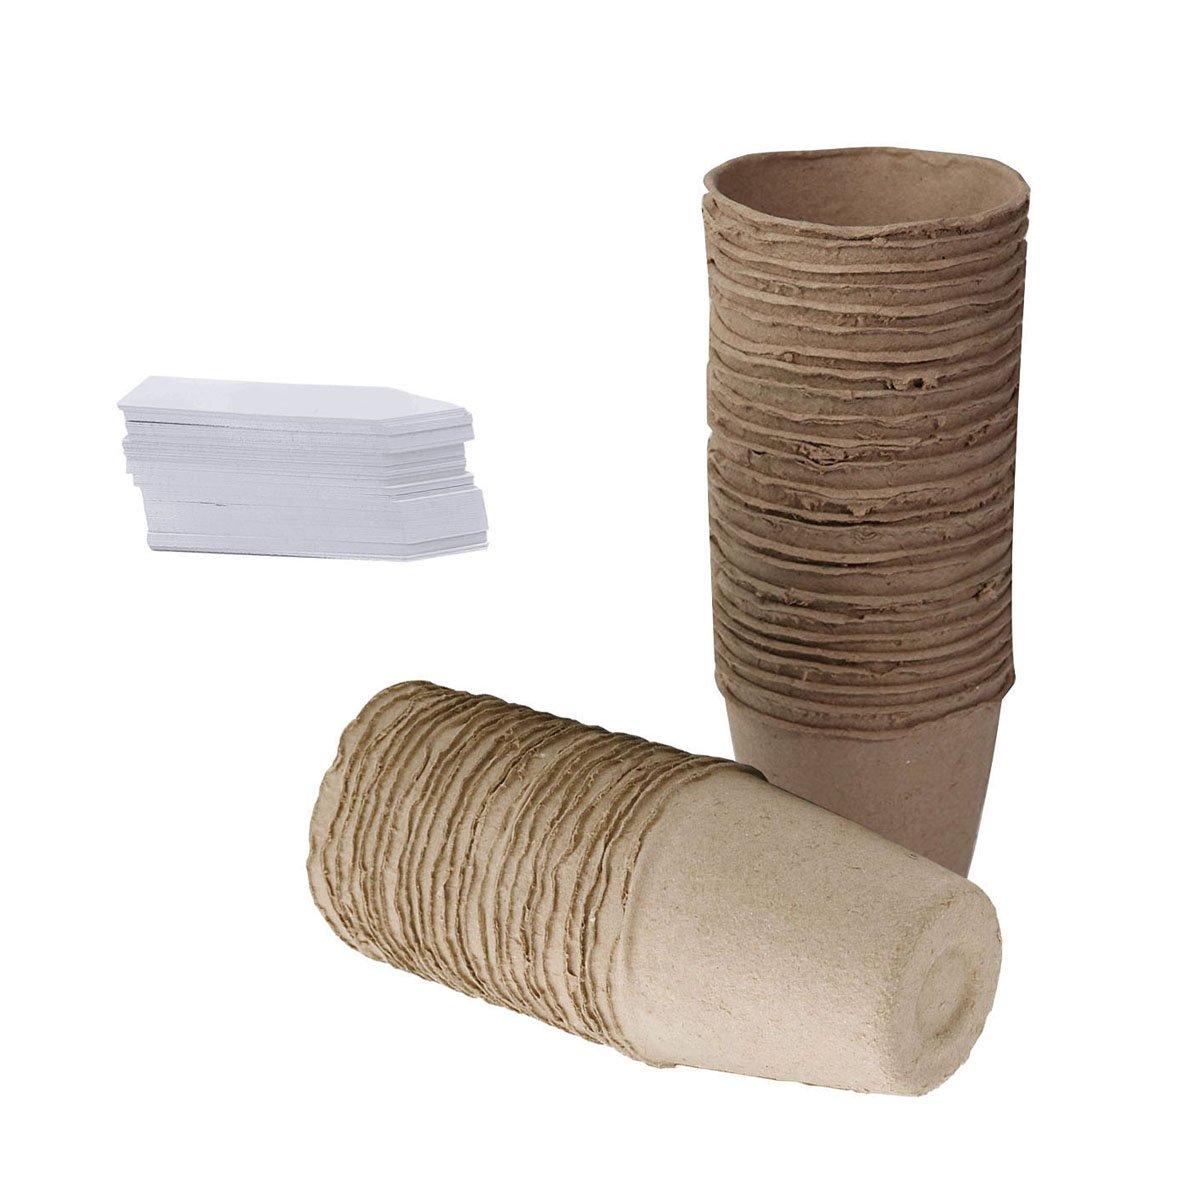 KINGLAKE 100 Pcs 6 cm Small Round Fibre Pots Biodegradable Seed Seedling Pots 1